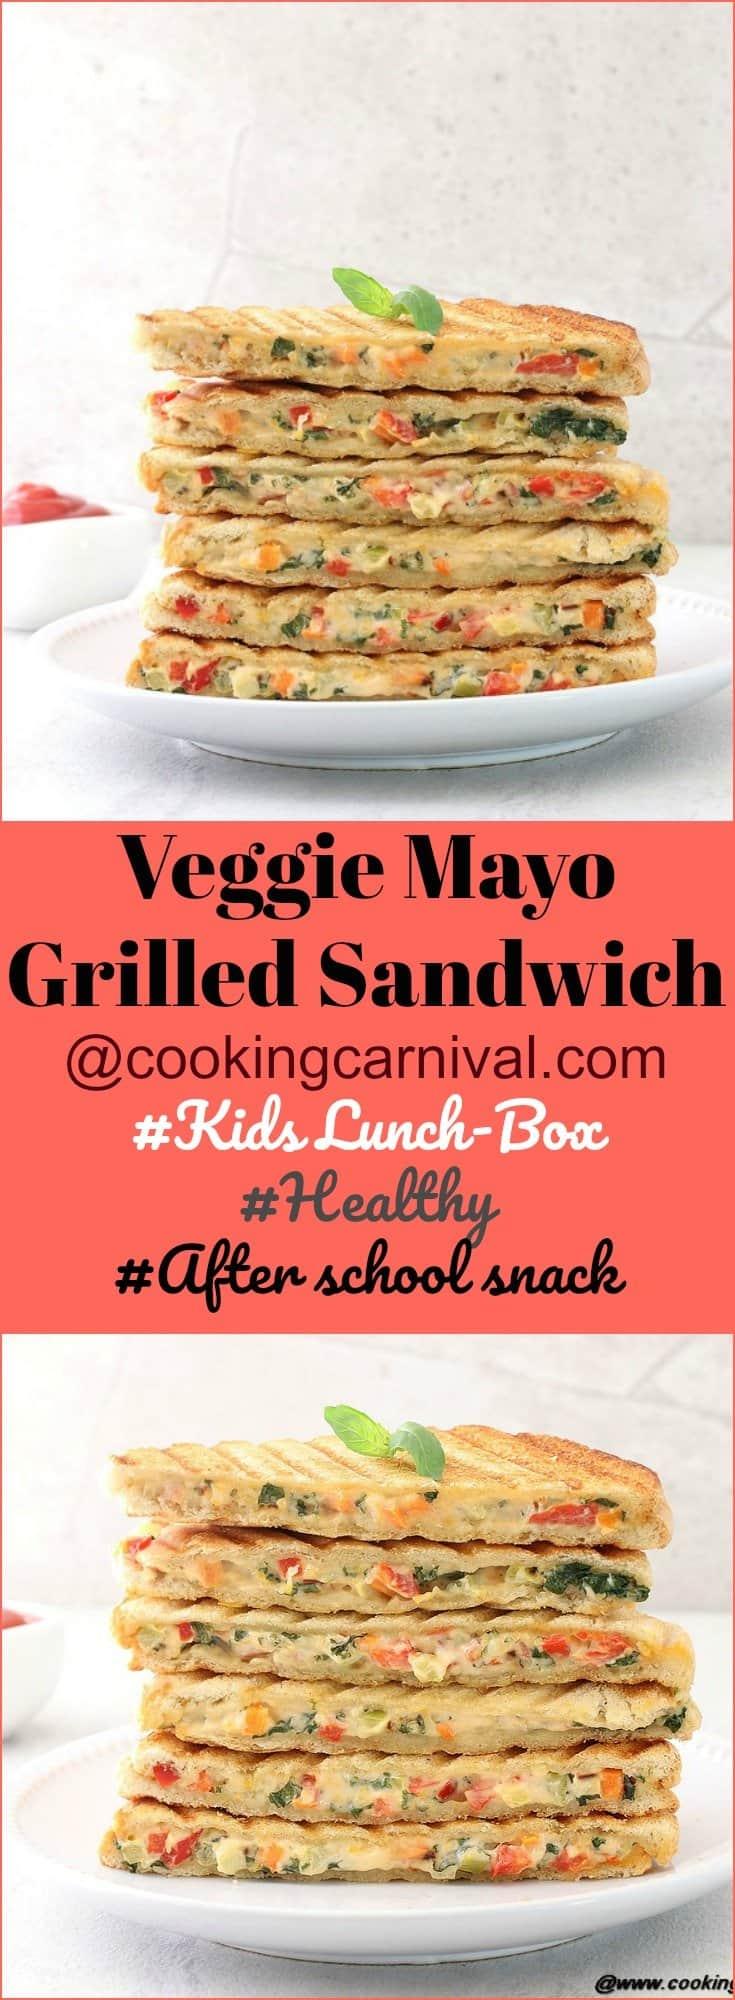 Veg Mayo Grilled Sandwich5